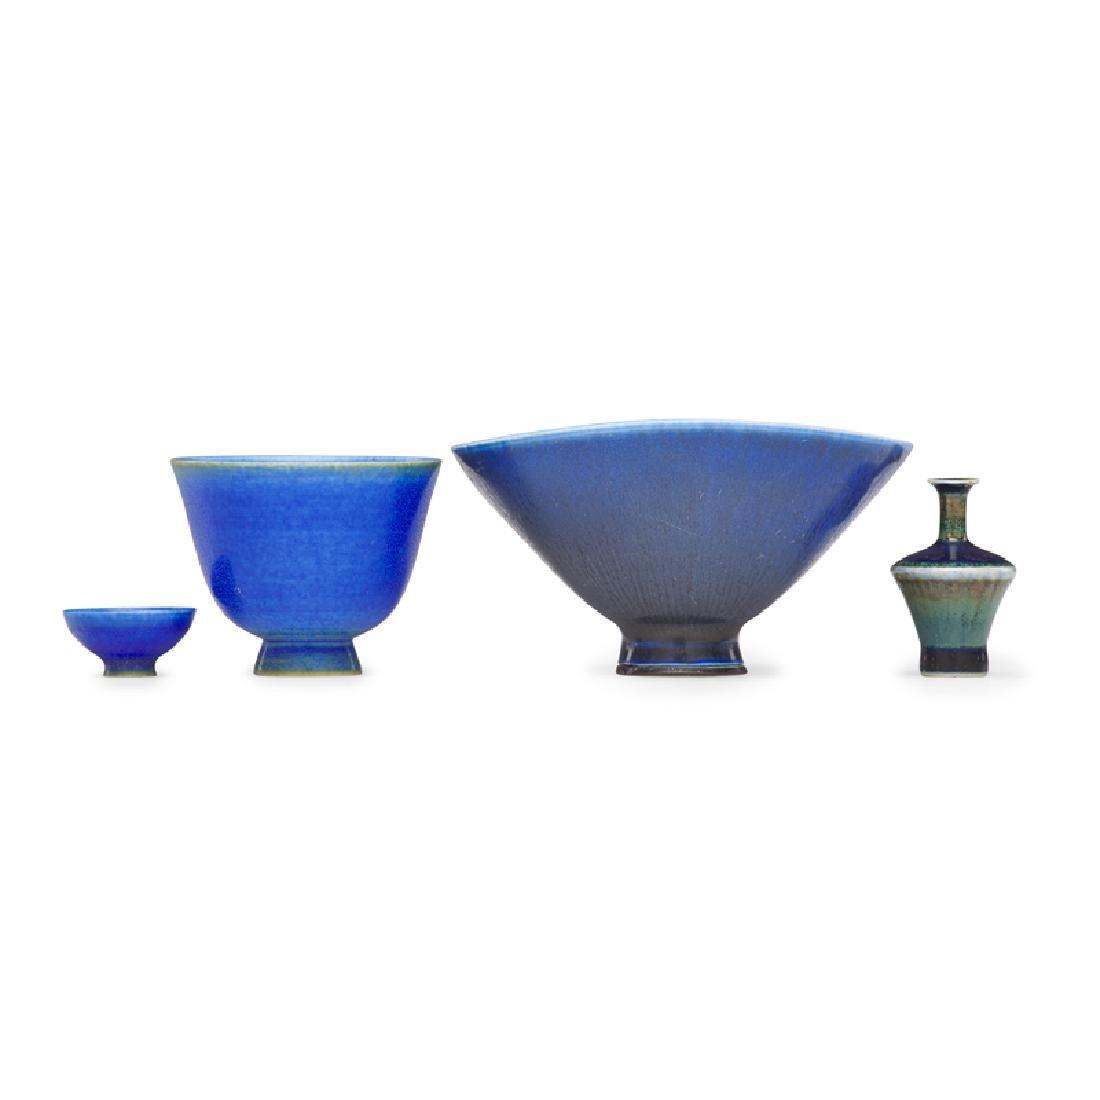 BERNDT FRIBERG ETC. Four miniature vases - 2